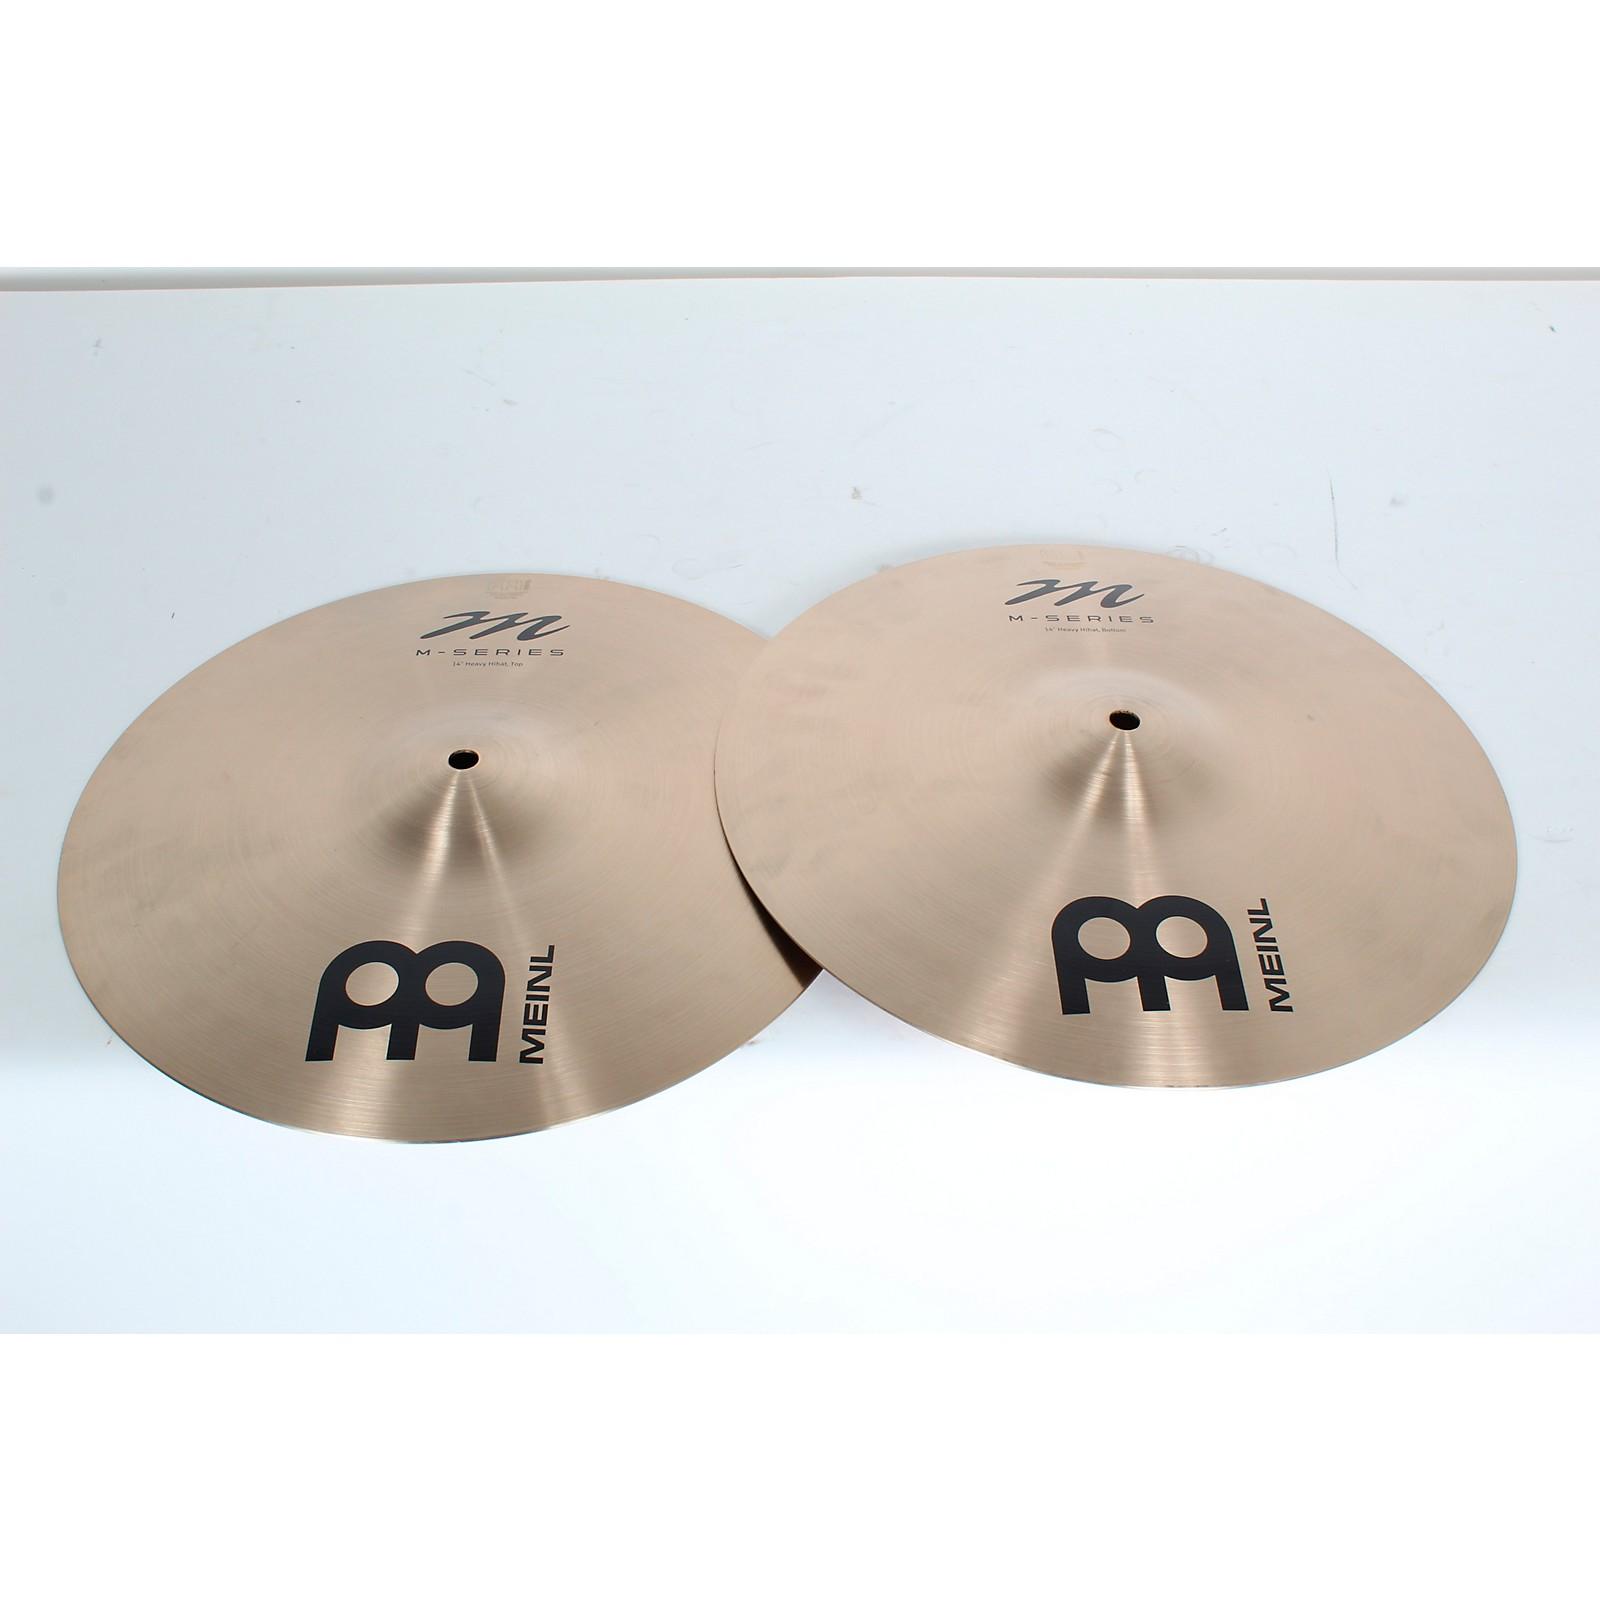 Open Box Meinl M-Series Heavy Hi-Hat Cymbal Pair